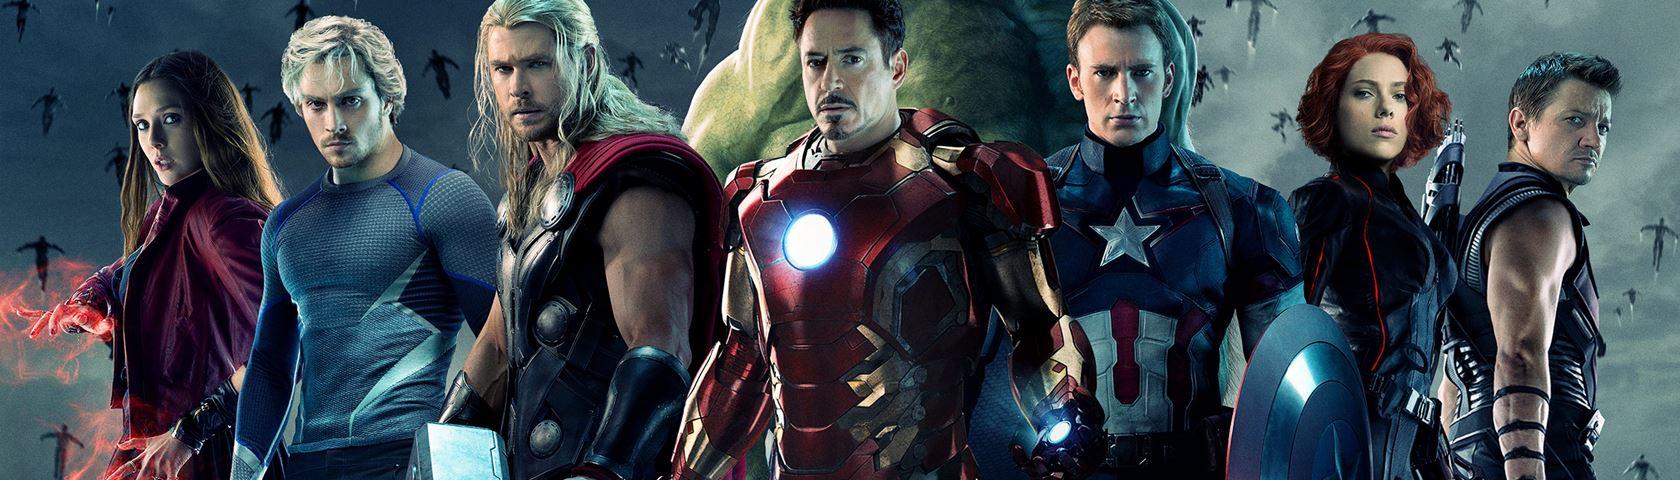 Avengers Dual Monitor Wallpaper